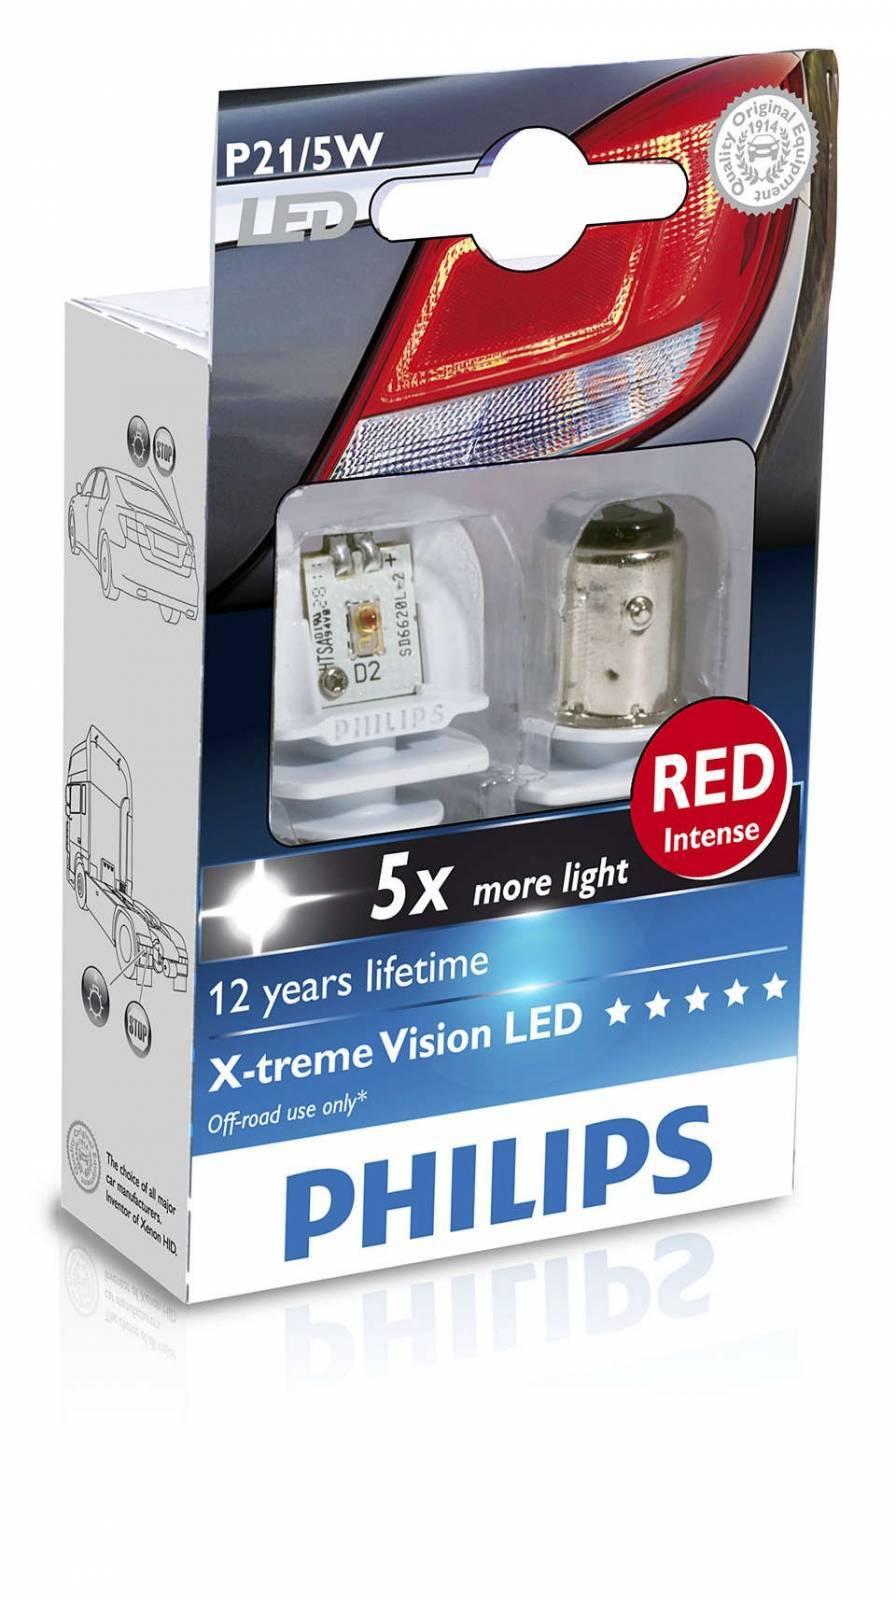 Lâmpada P21/5W LED PHILIPS Par 2 Polos Vermelha Freio - XTreme Vision - Loja FullPower